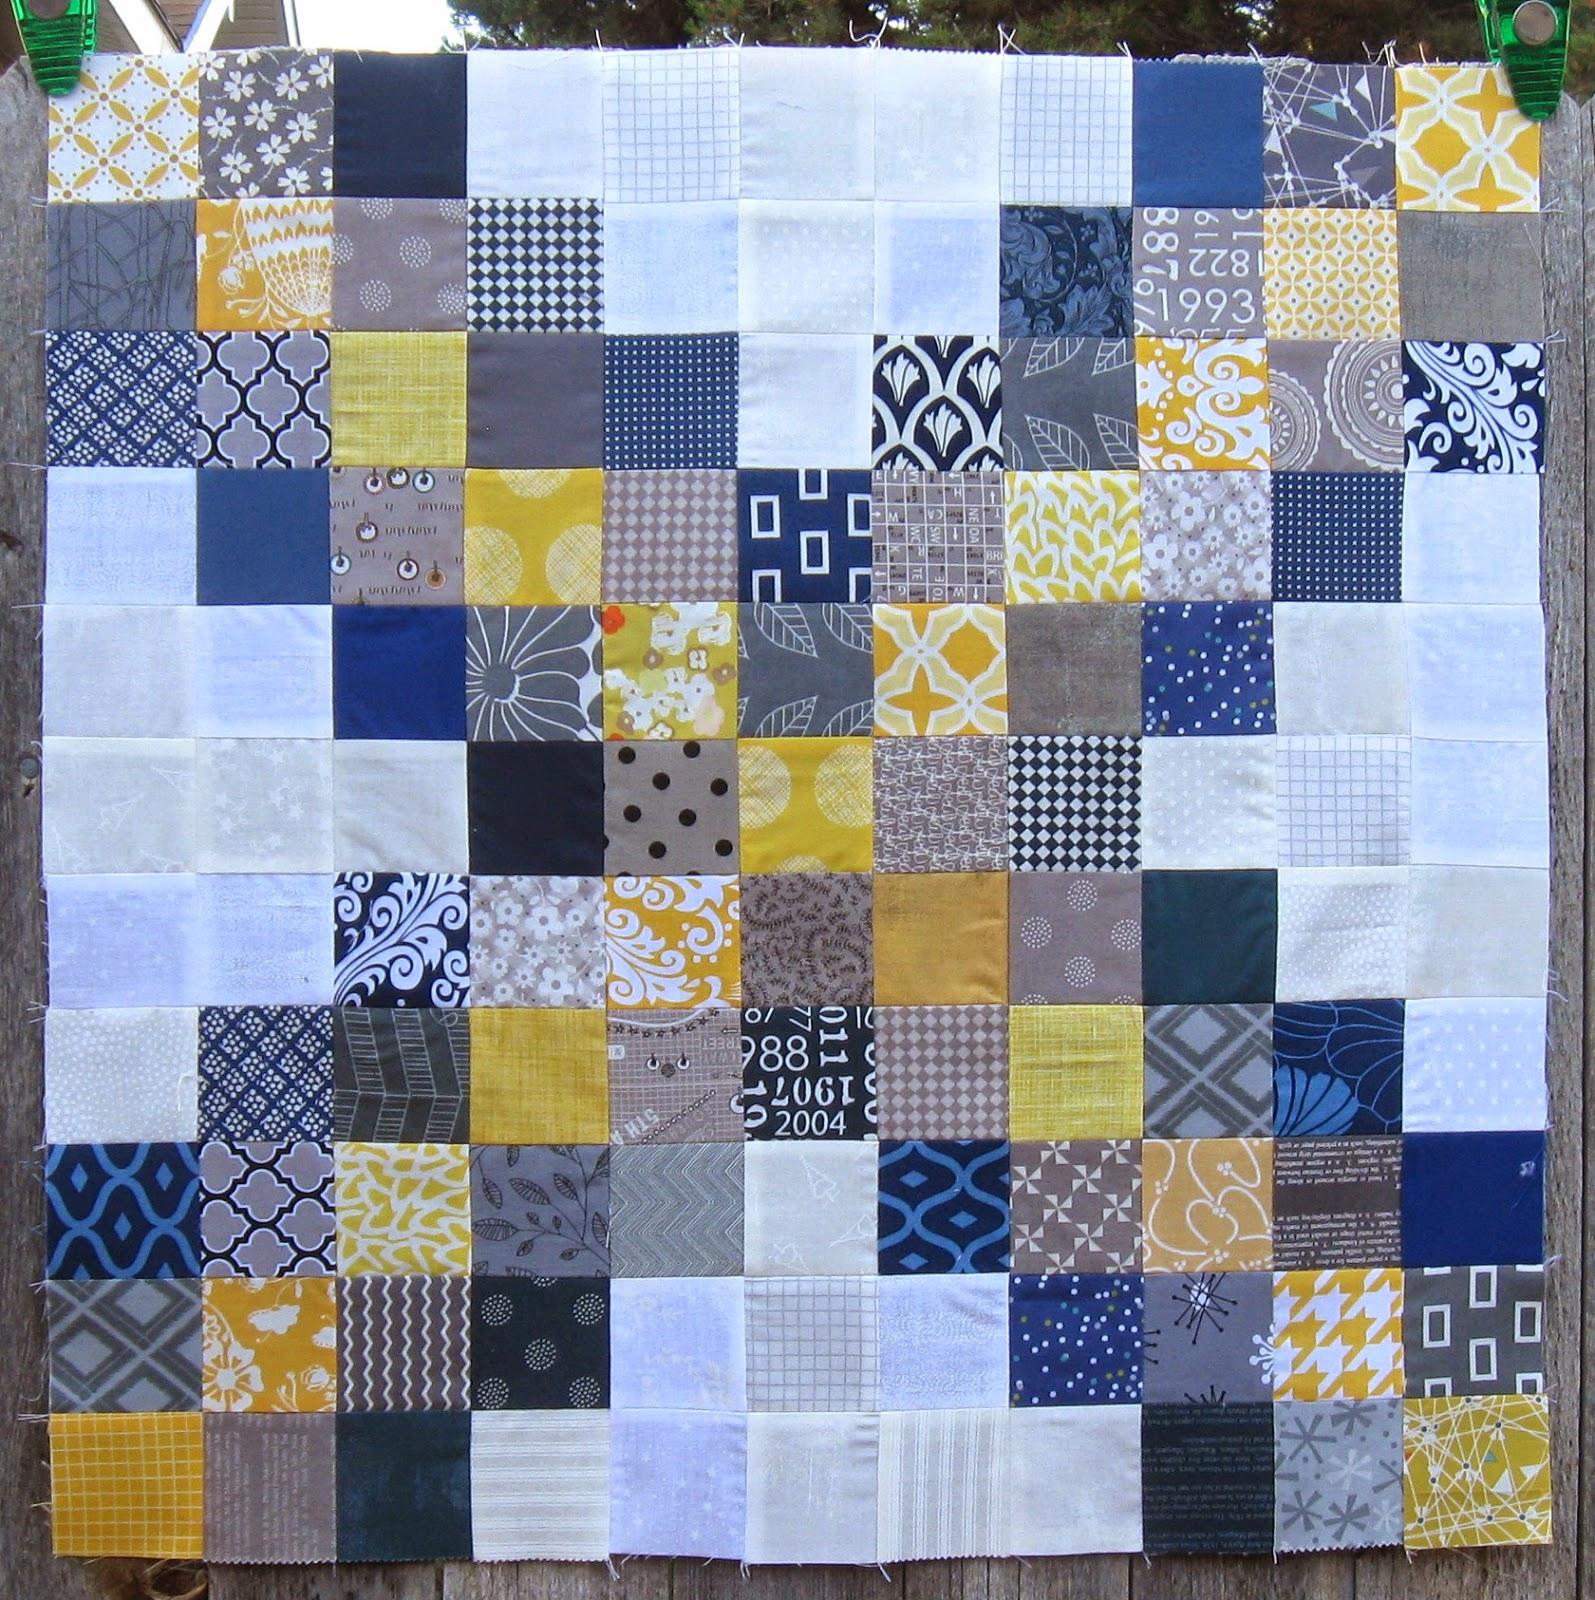 Happy Quilting: Super Scrappy Triple Irish Chain Block - A Tutorial : triple irish chain quilt pattern - Adamdwight.com